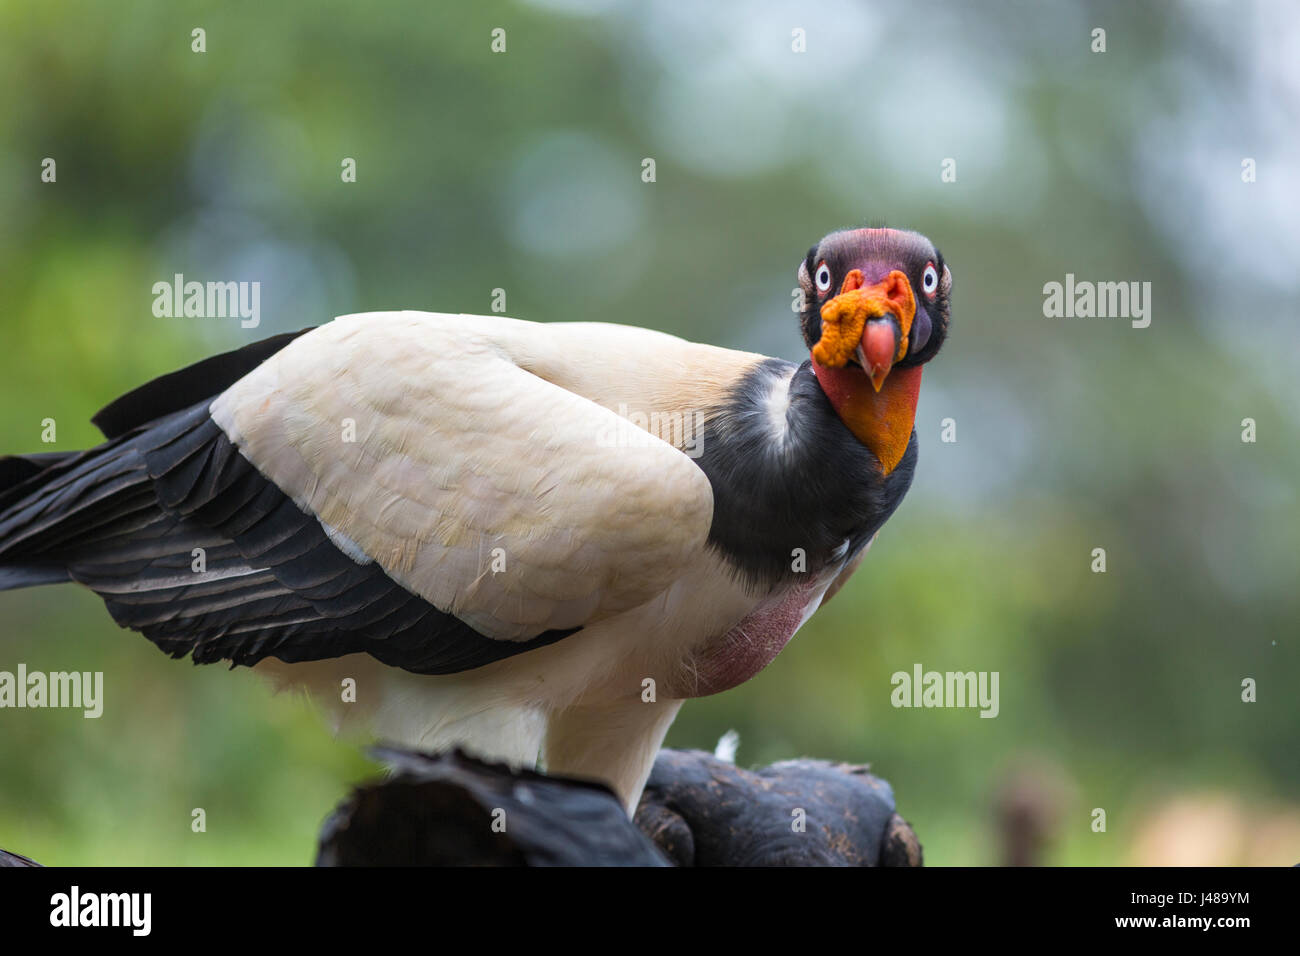 King Vulture, Sarcoramphus papa, à la recherche à la caméra à Laguna del Lagarto, Boca Tapada, Photo Stock